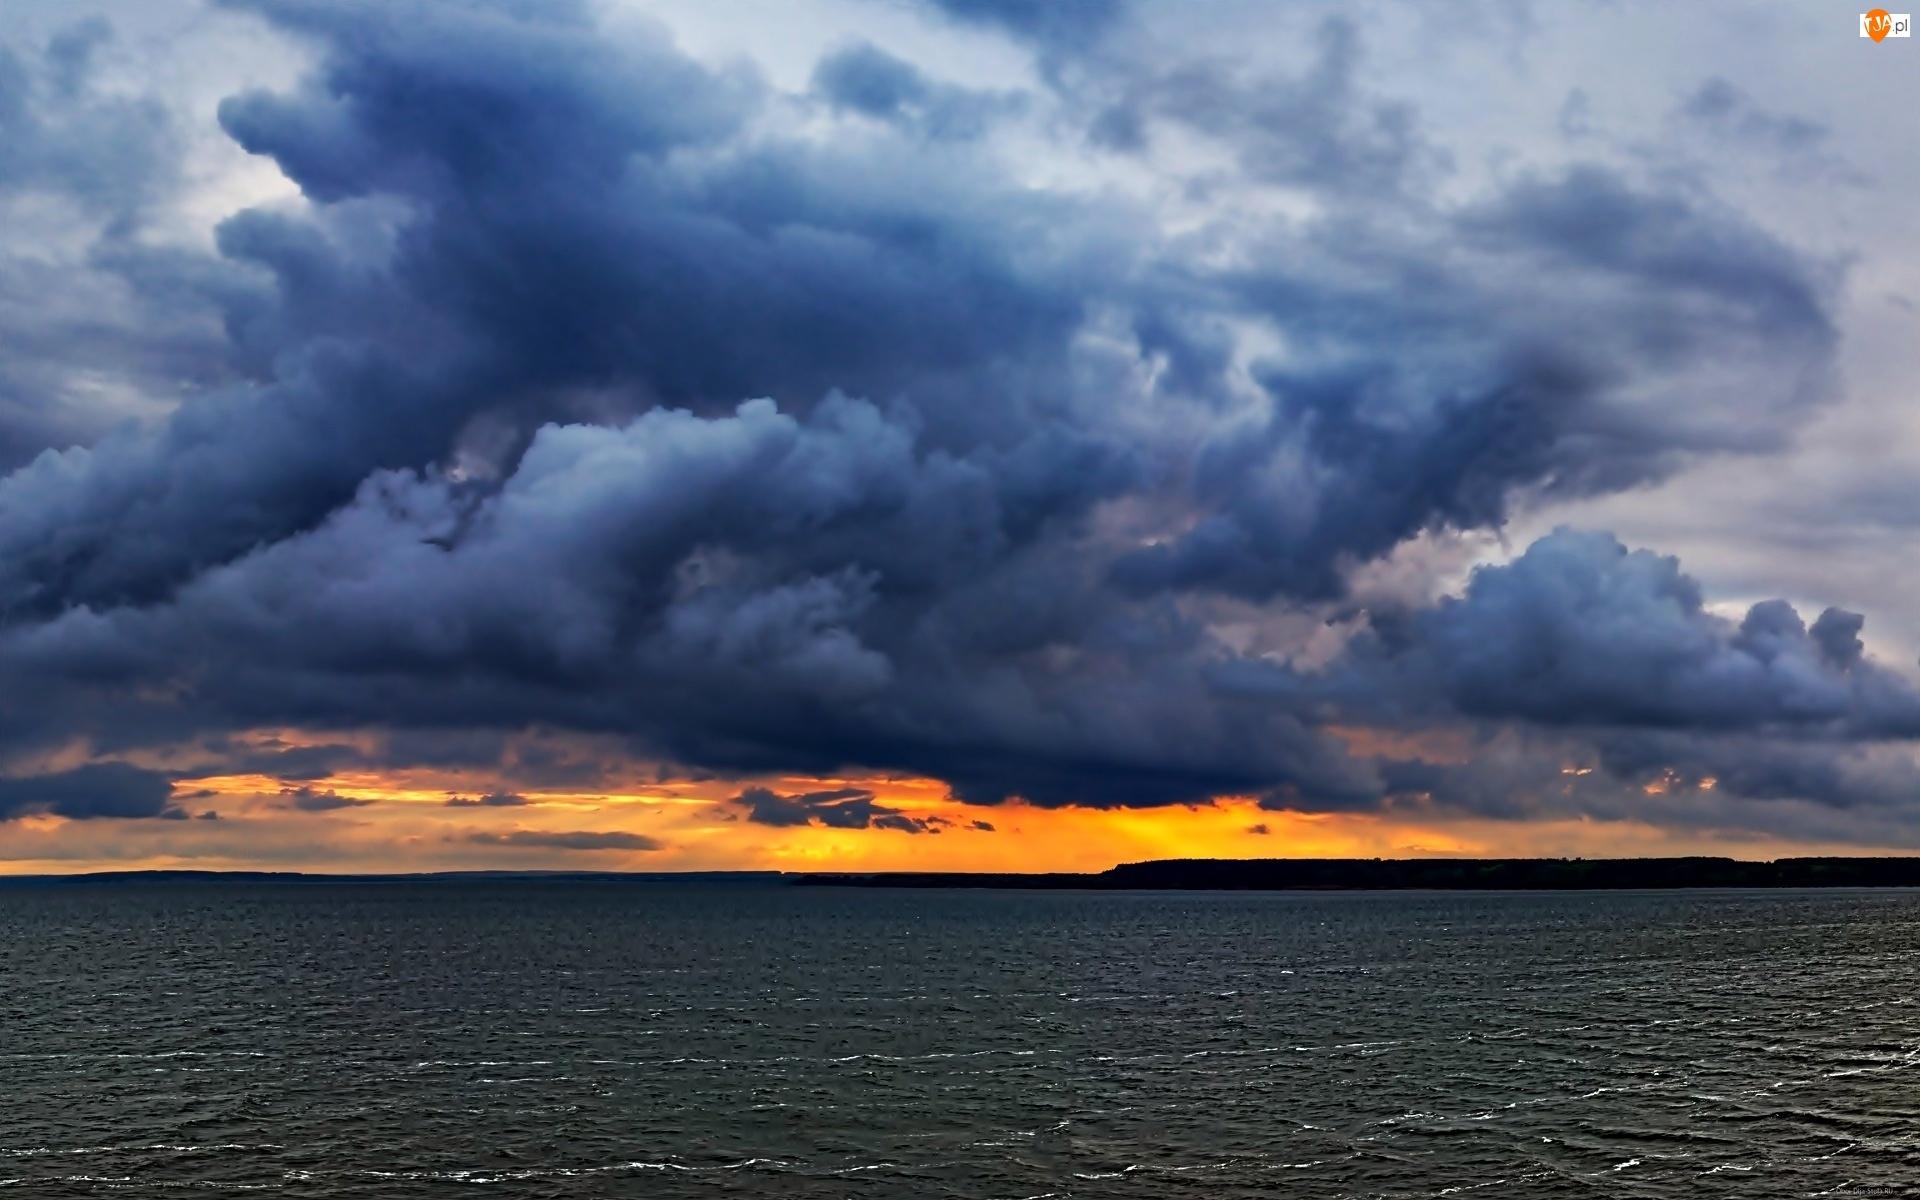 Morze, Chmury, Zachód Słońca, Ciemne